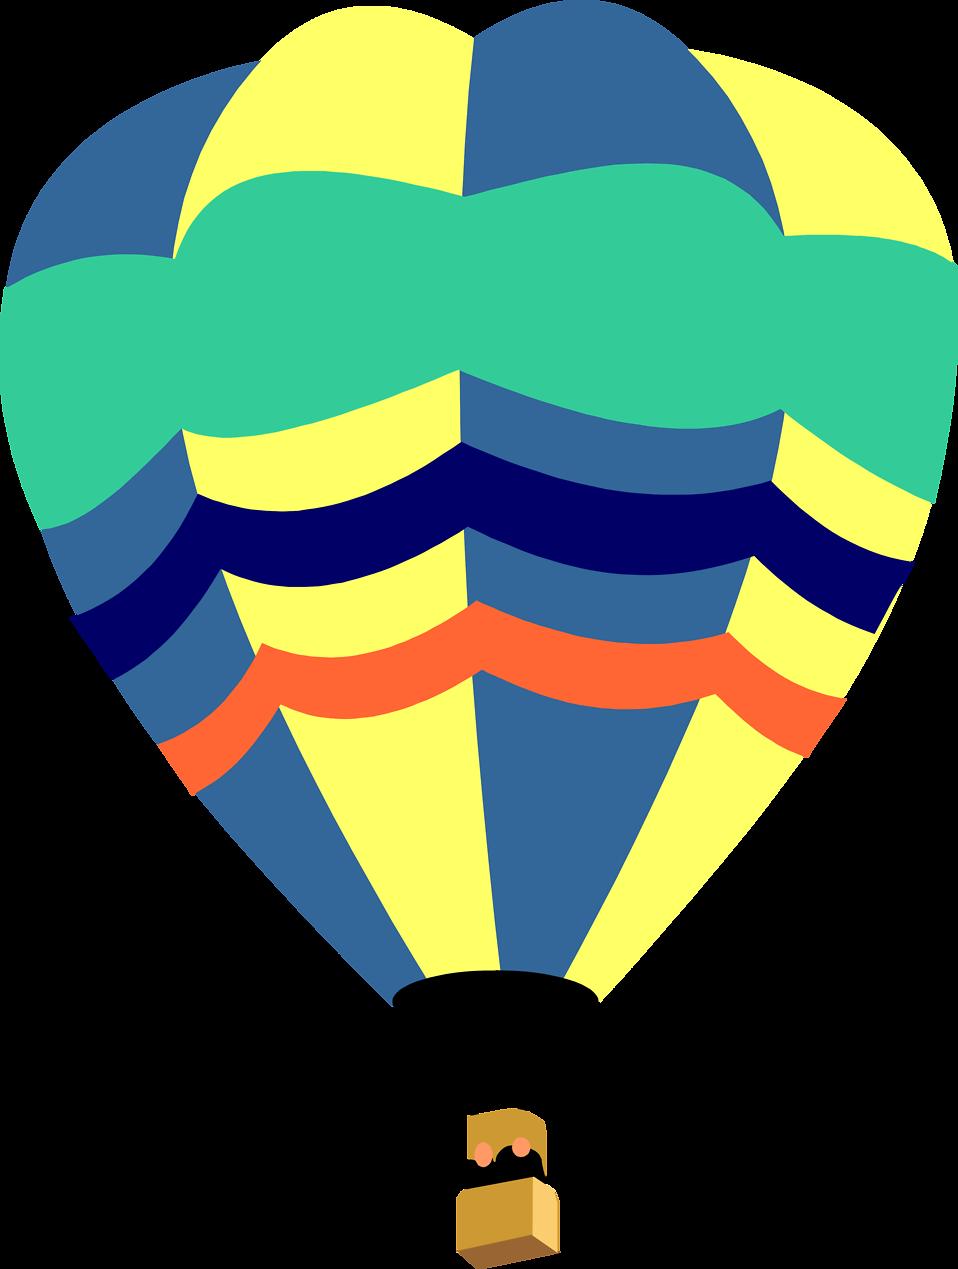 Hot Air Balloon Clip Art Outline Clipart Panda Free Clipart Images Hot Air Balloon Clipart Hot Air Balloon Air Balloon